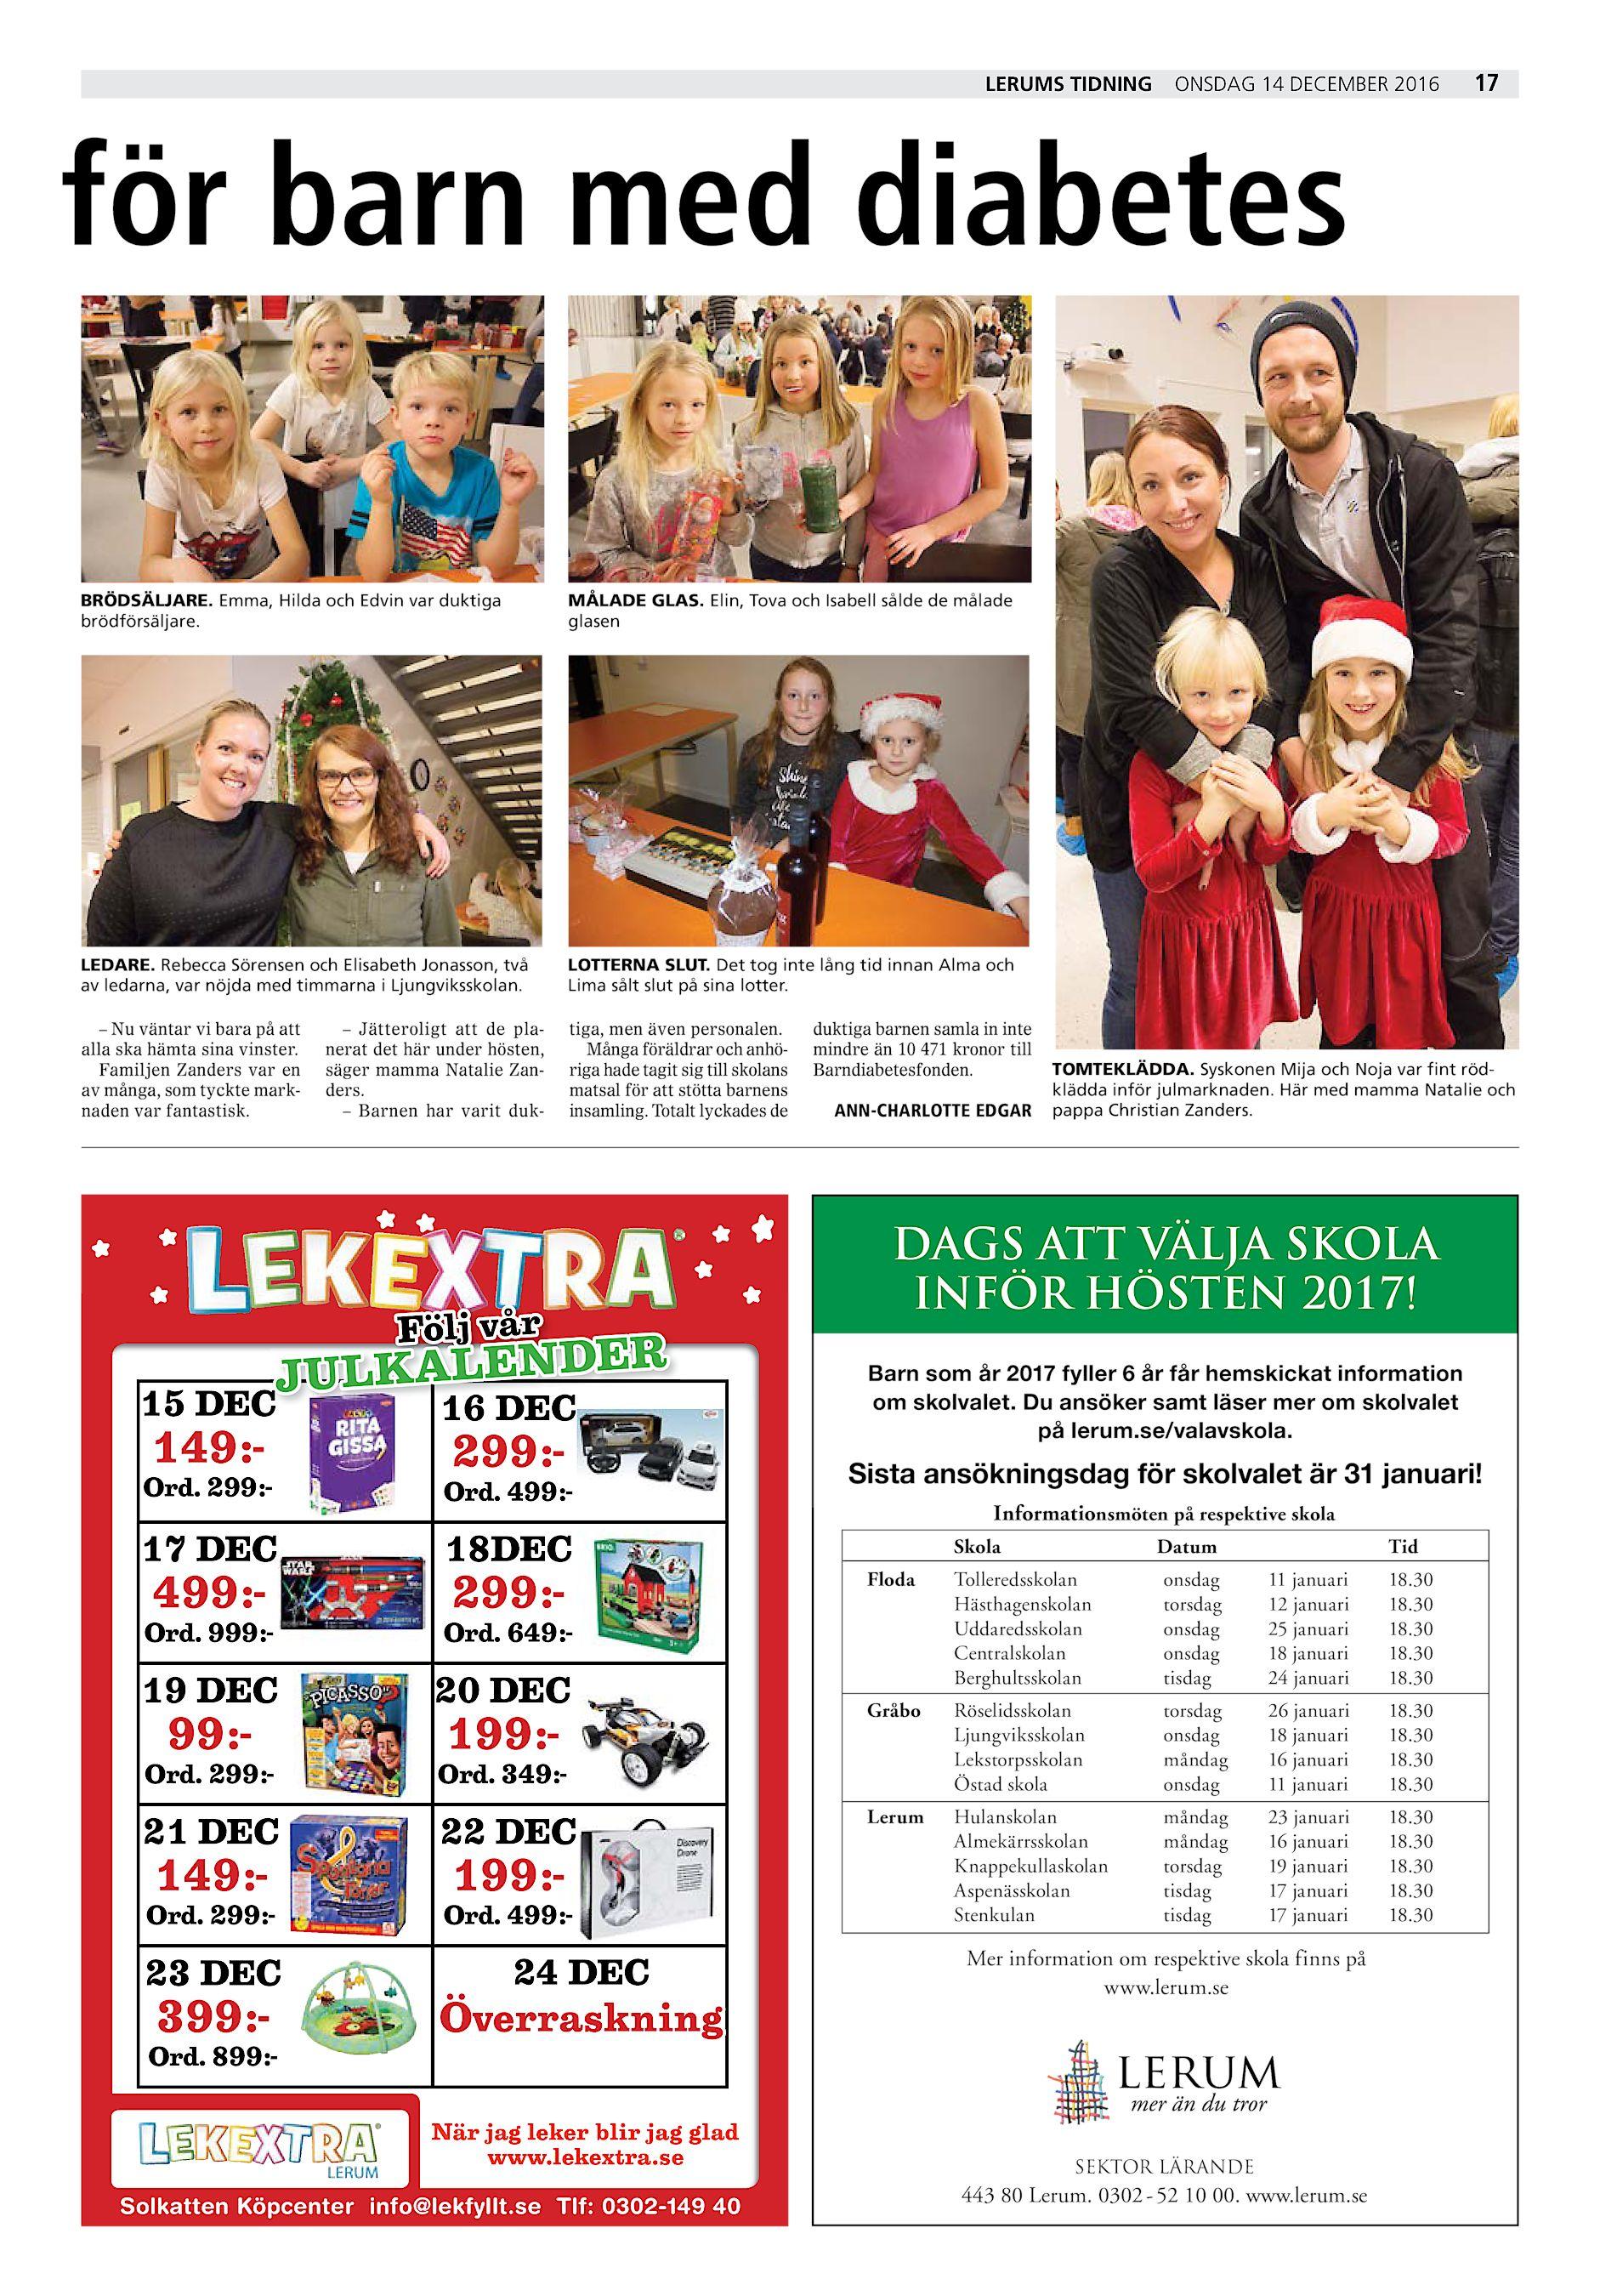 4938bcfbd58 Lerums tidning LT-2016-12-14 (text only)